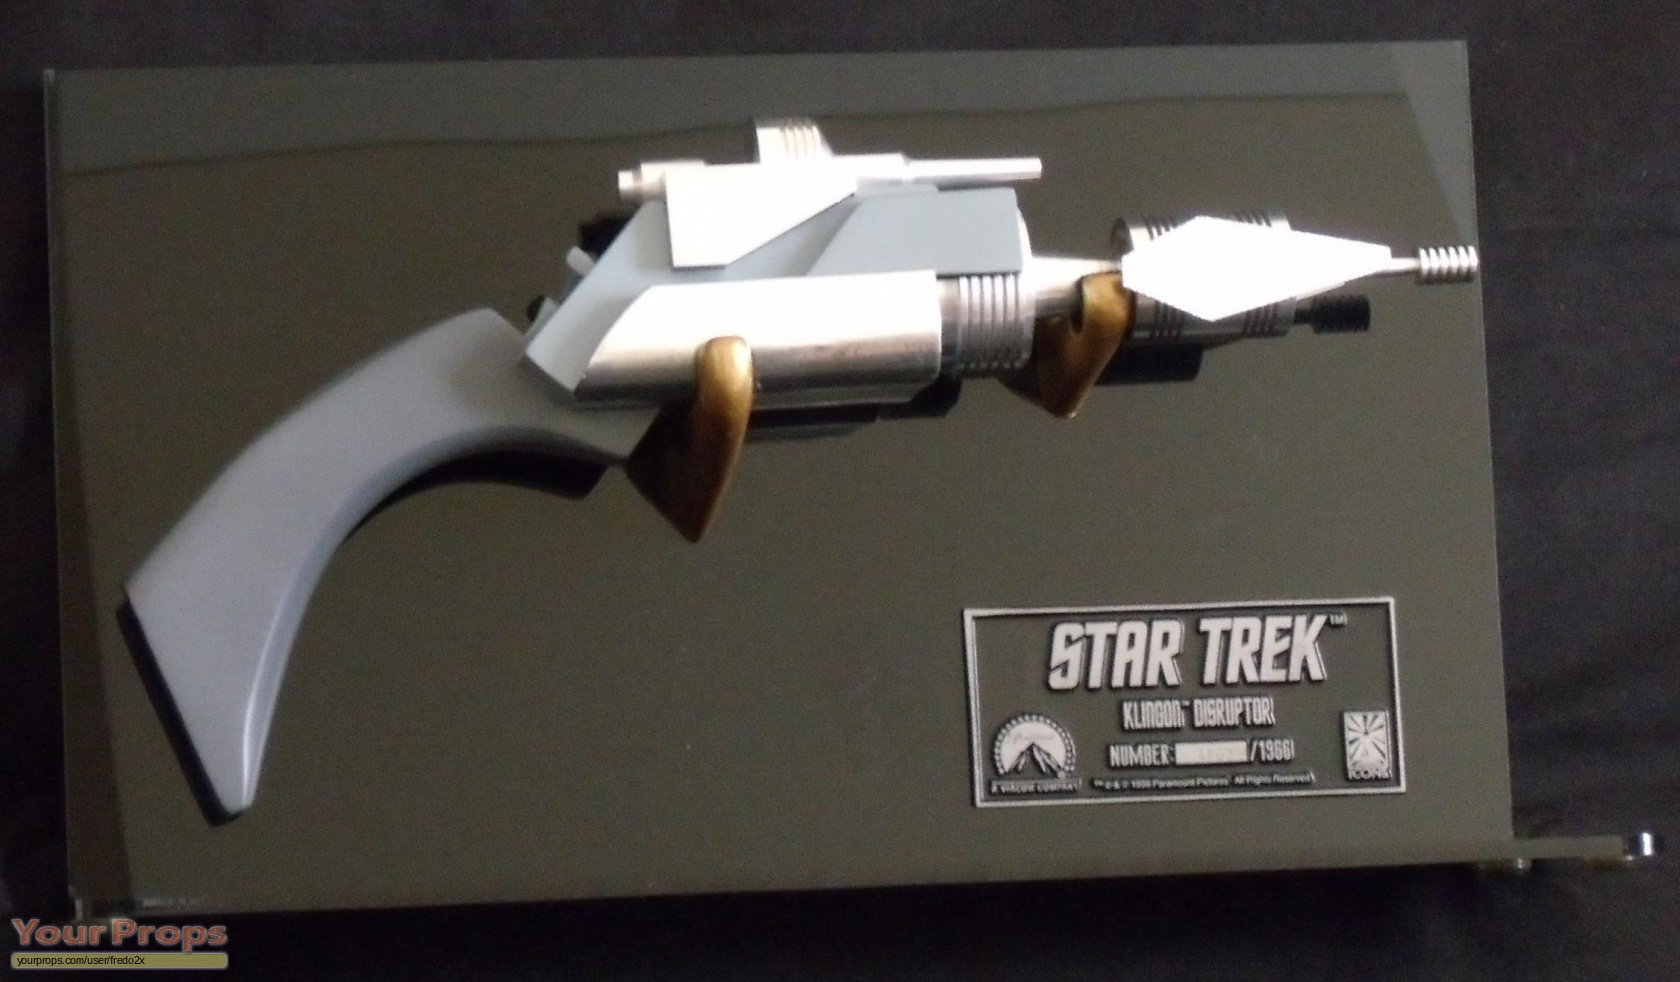 Star-Trek-The-Original-Series-TOS-Klingon-Disruptor-1.jpg